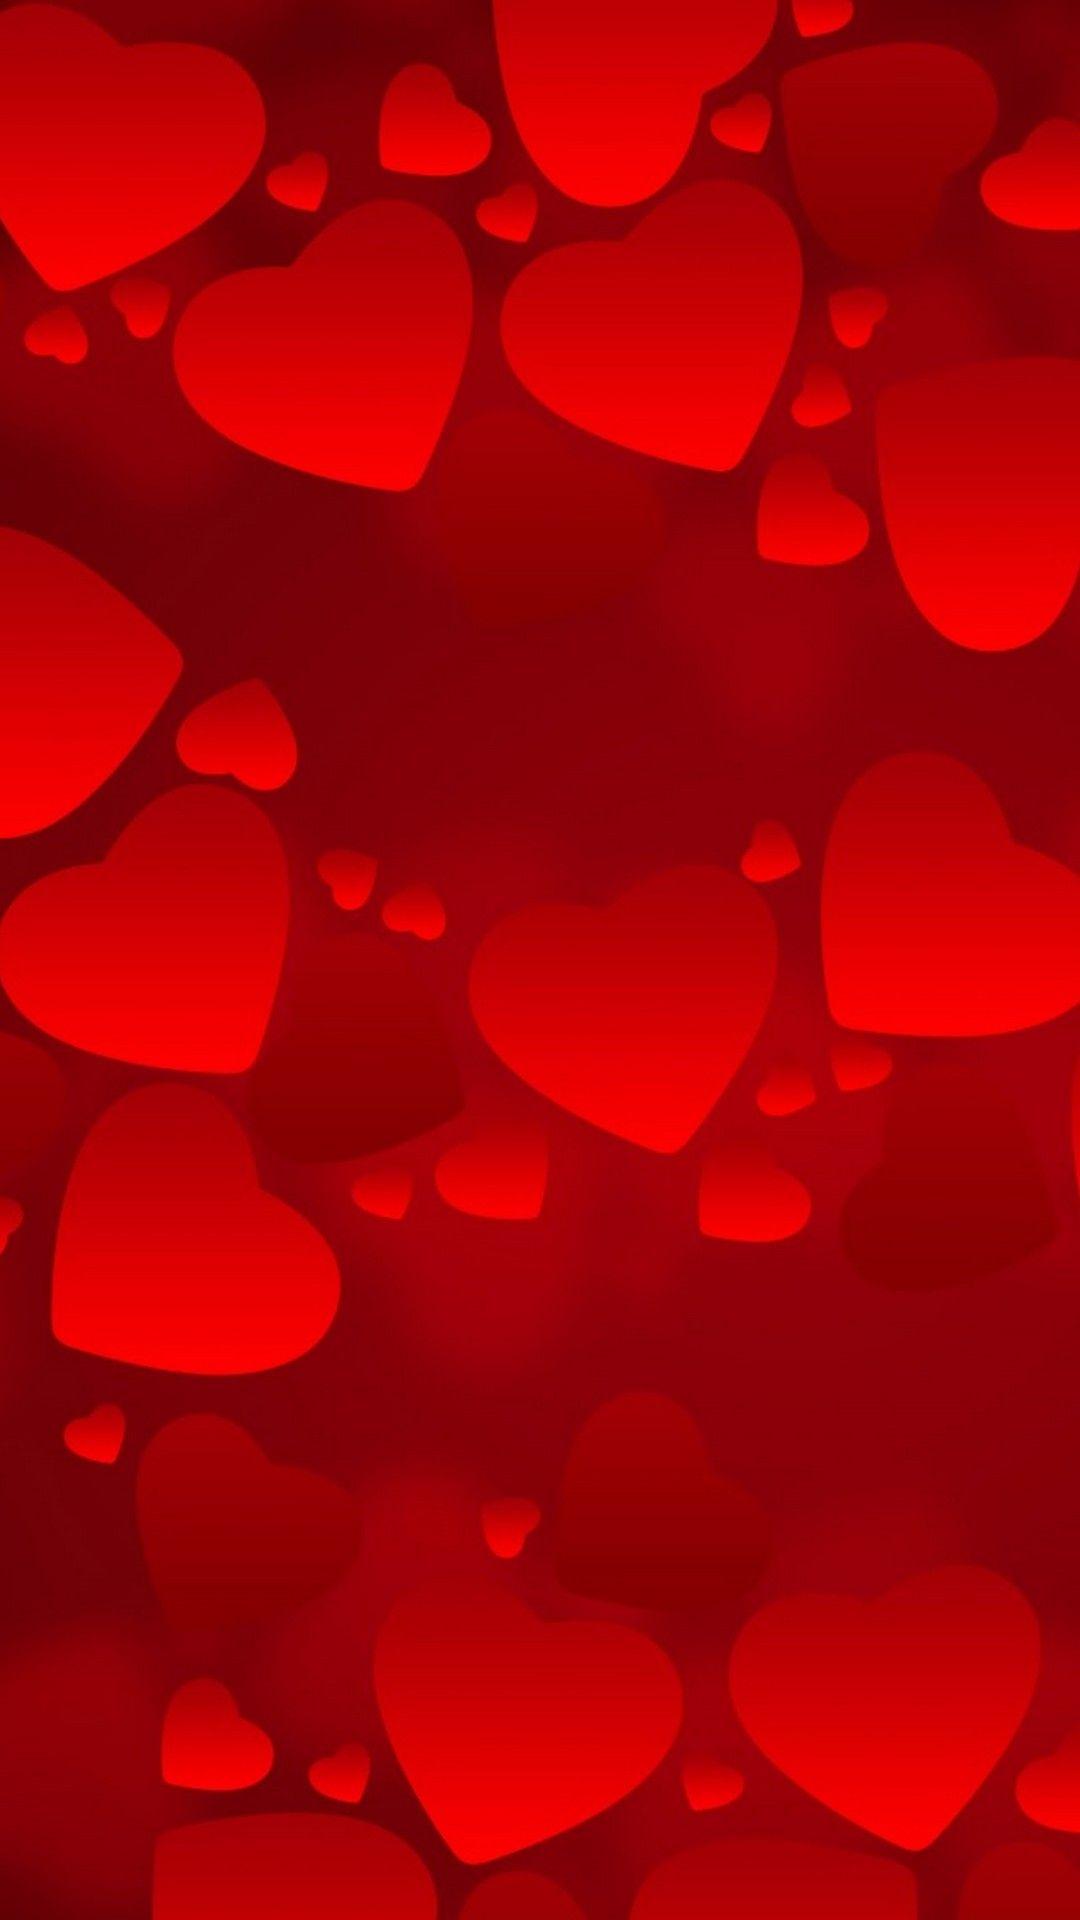 Red heart valentine wallpaper iphone iphonewallpapers - Valentines day background wallpaper ...